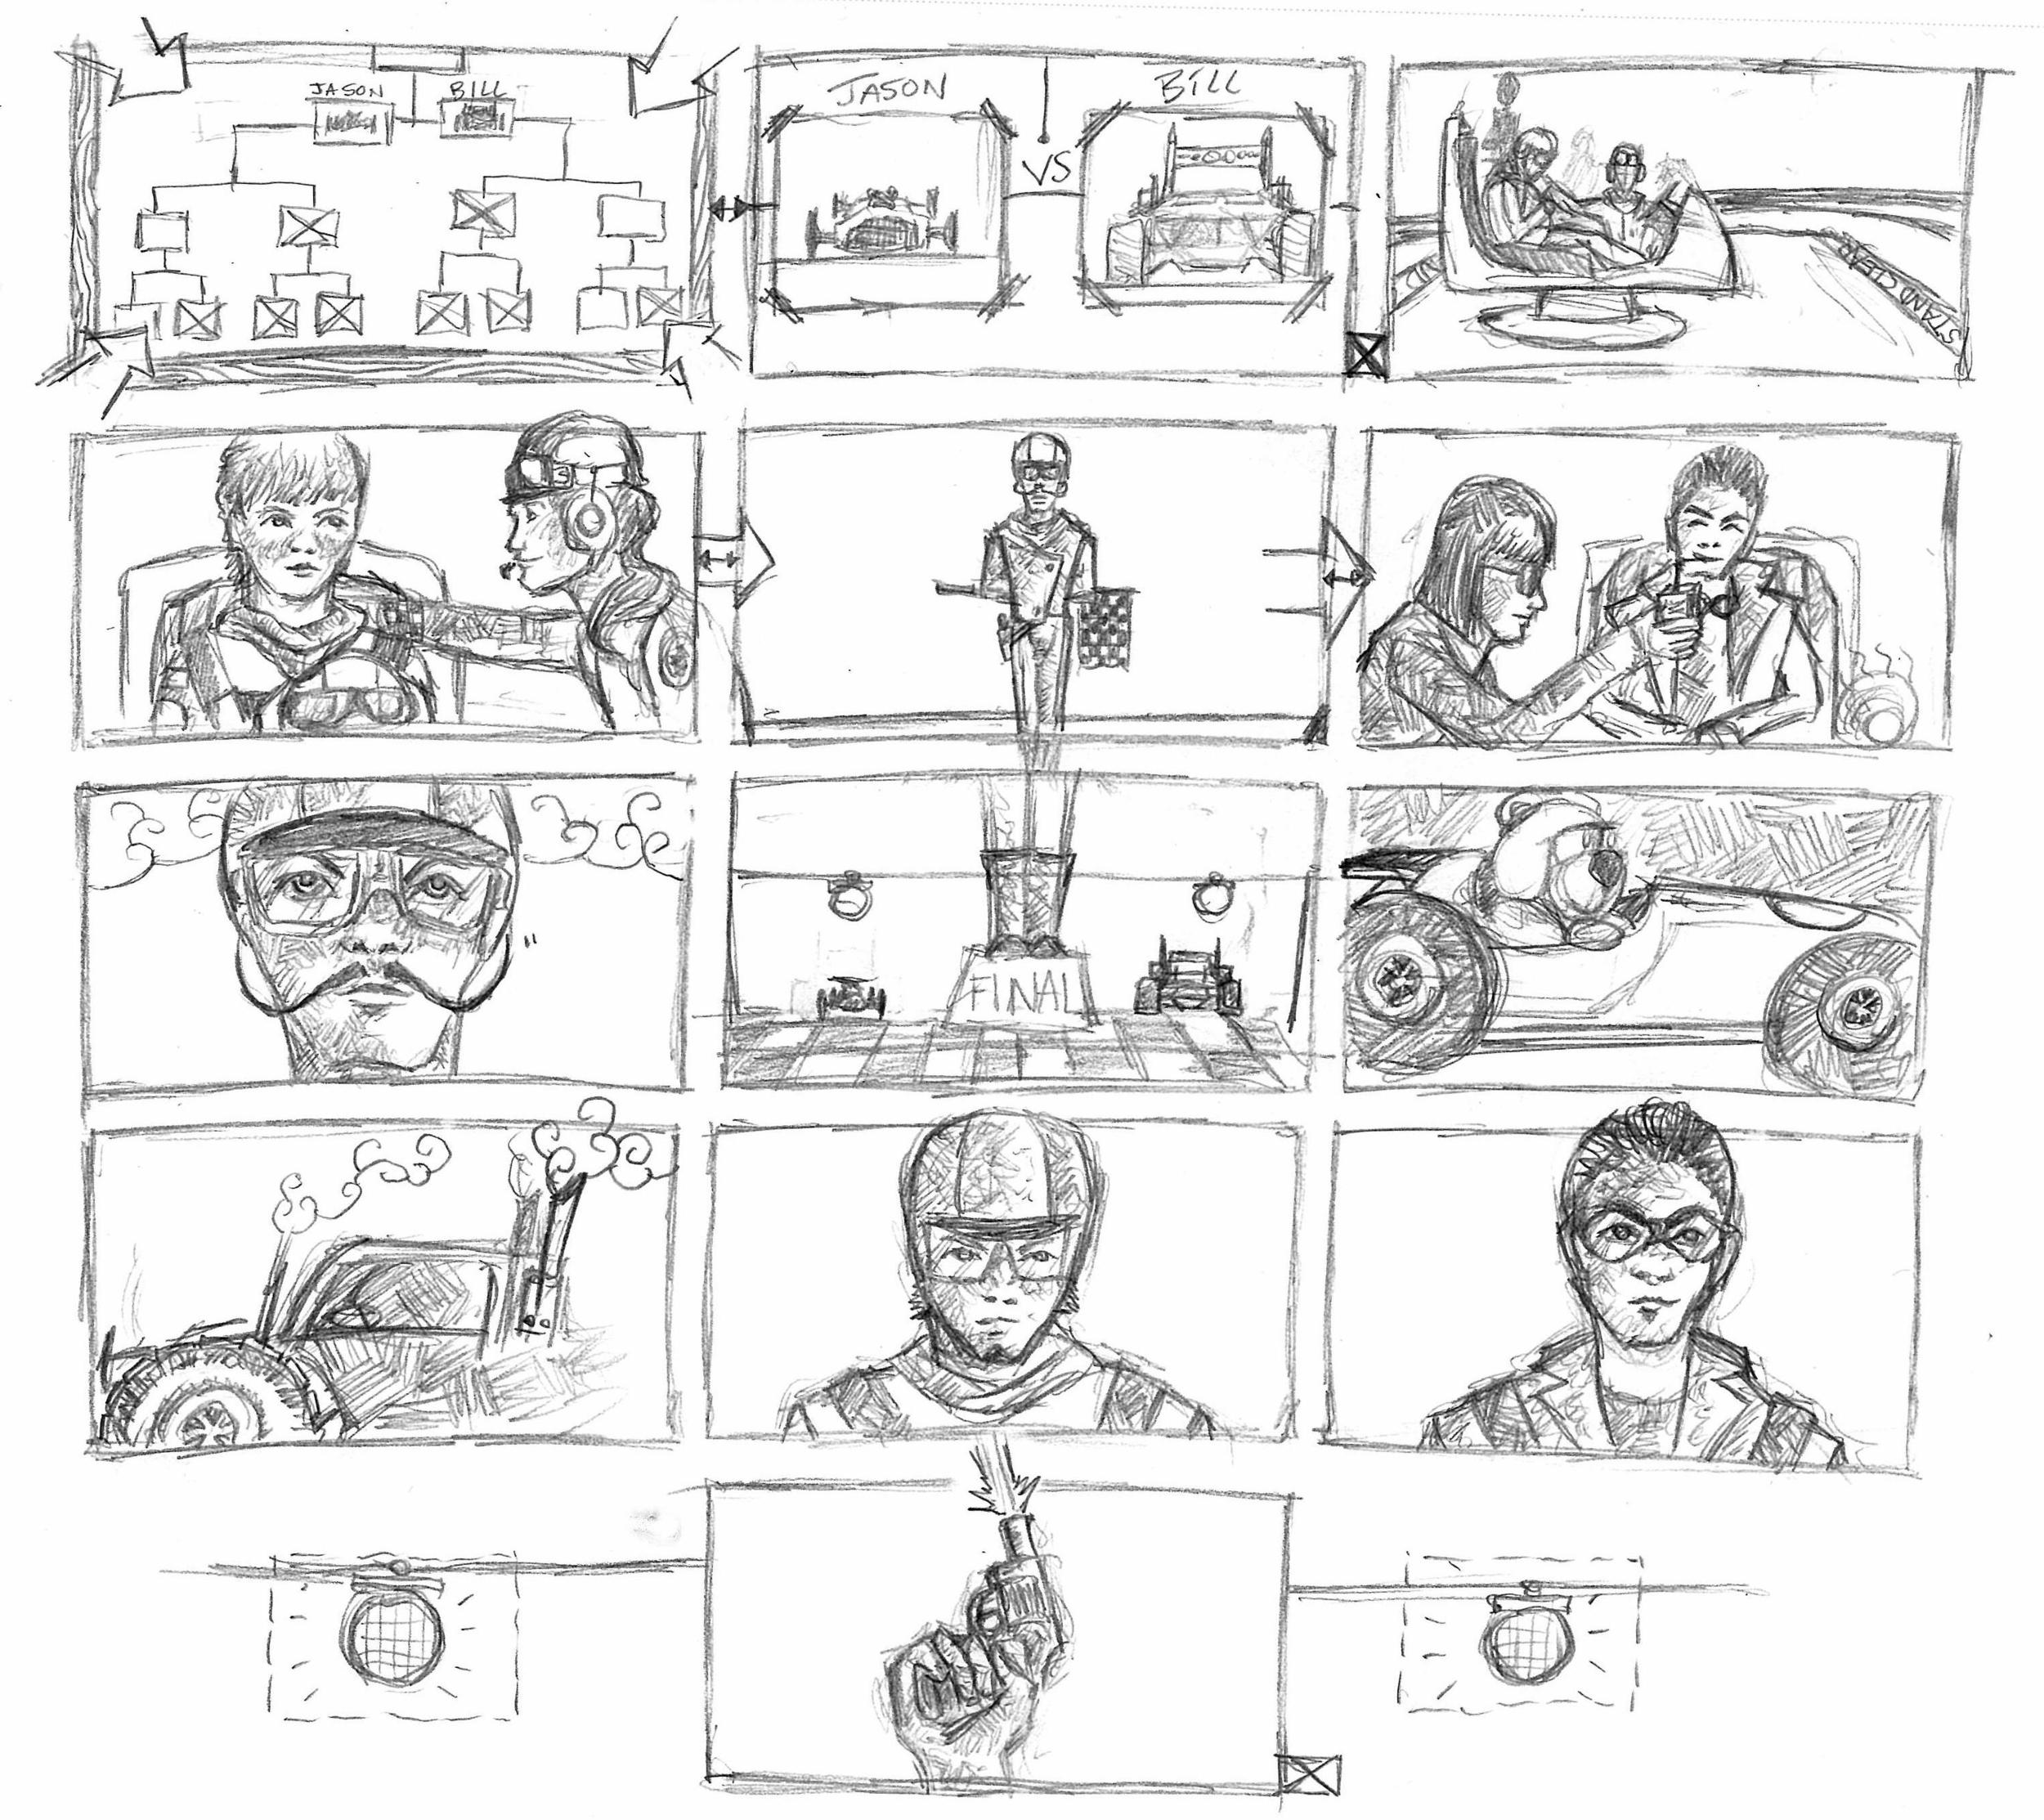 Prix Storyboard_PG010 - Film and TV - Jonathan B Perez - cREAtive Castle Studios.jpg